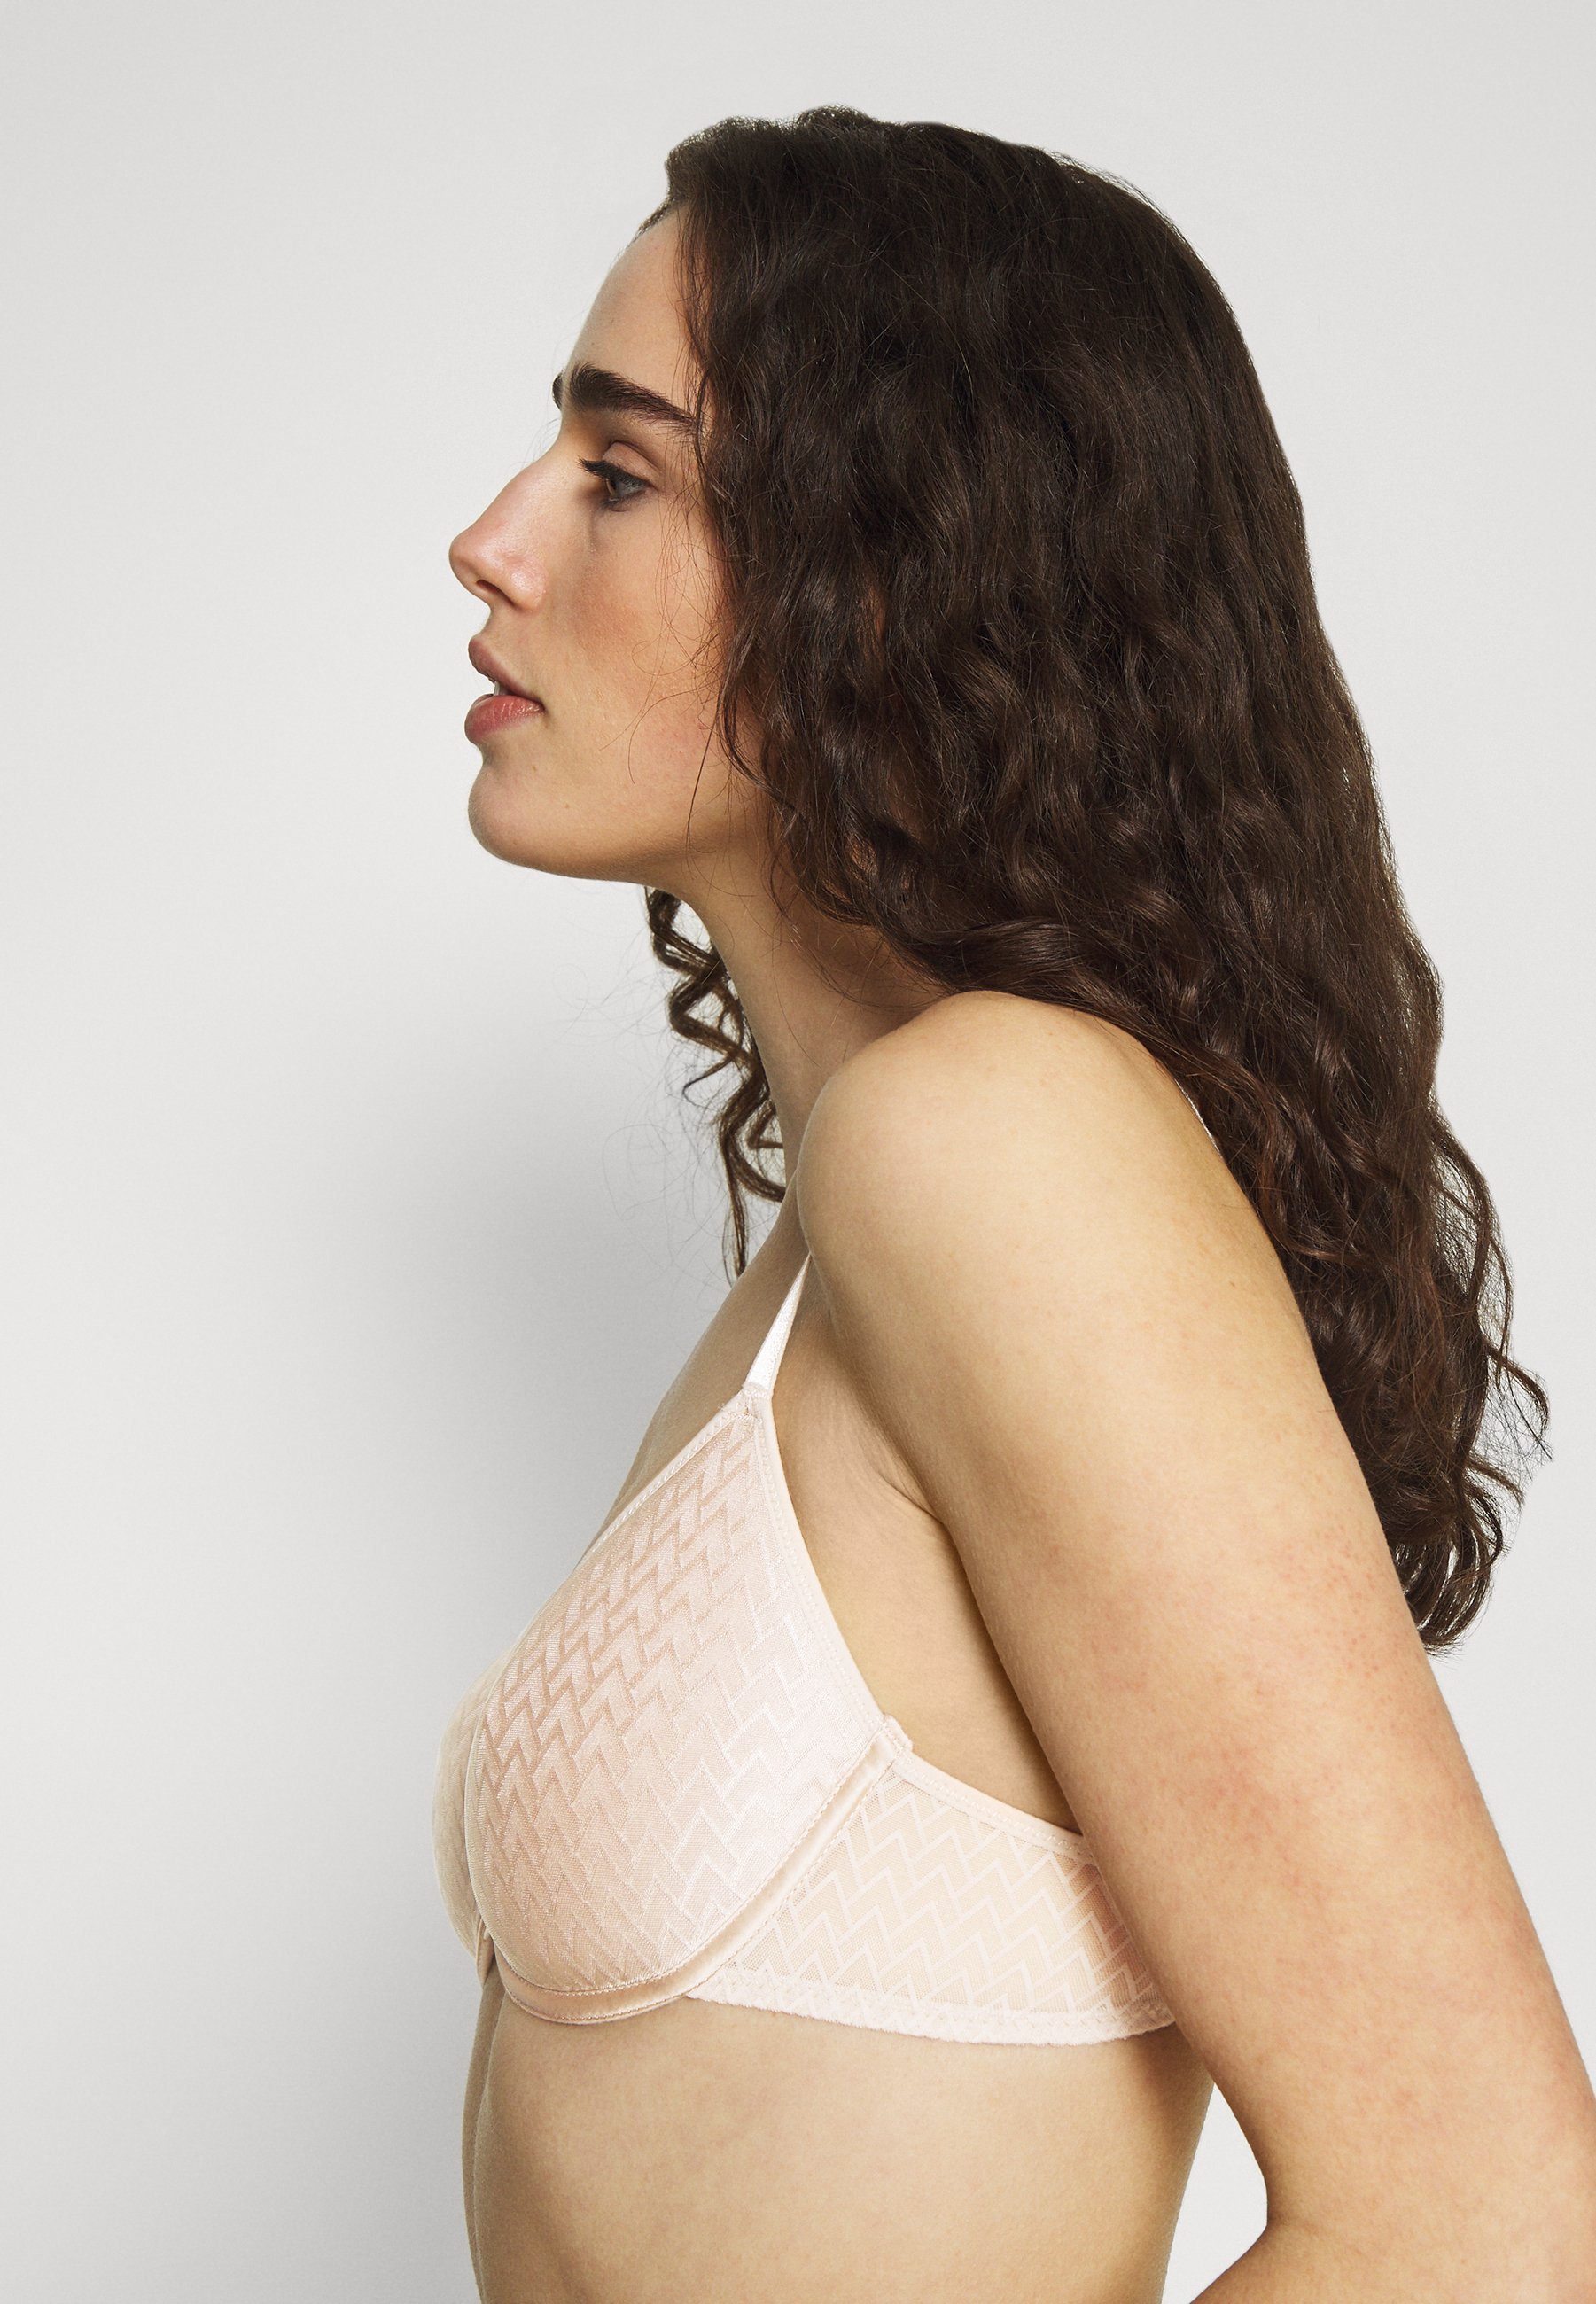 Women MANHATTAN SPACER - T-shirt bra